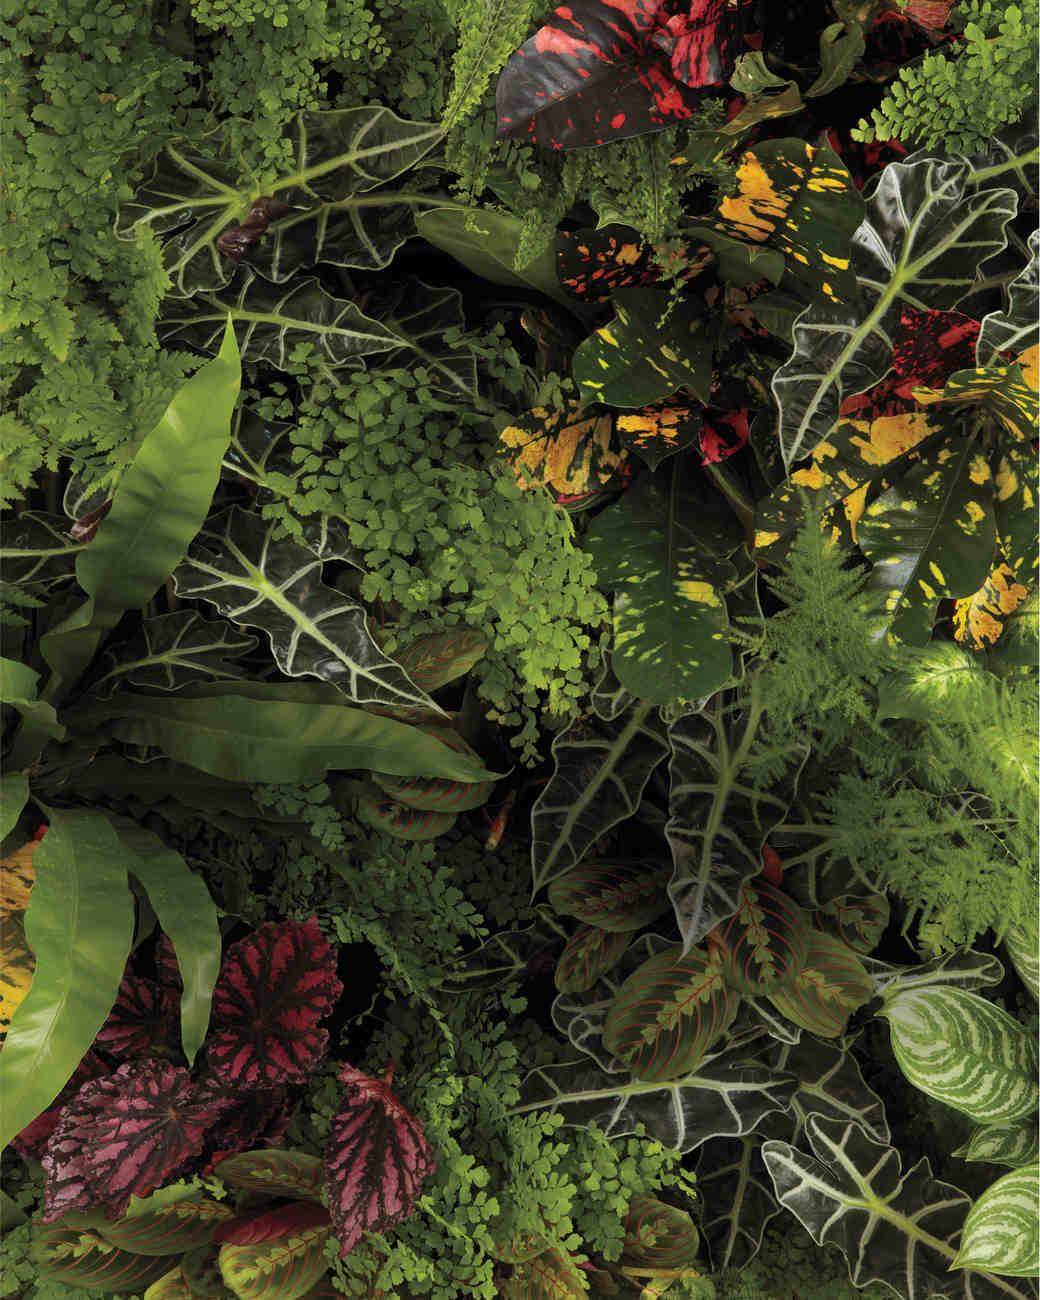 plants-wall-9523-mwd110013.jpg